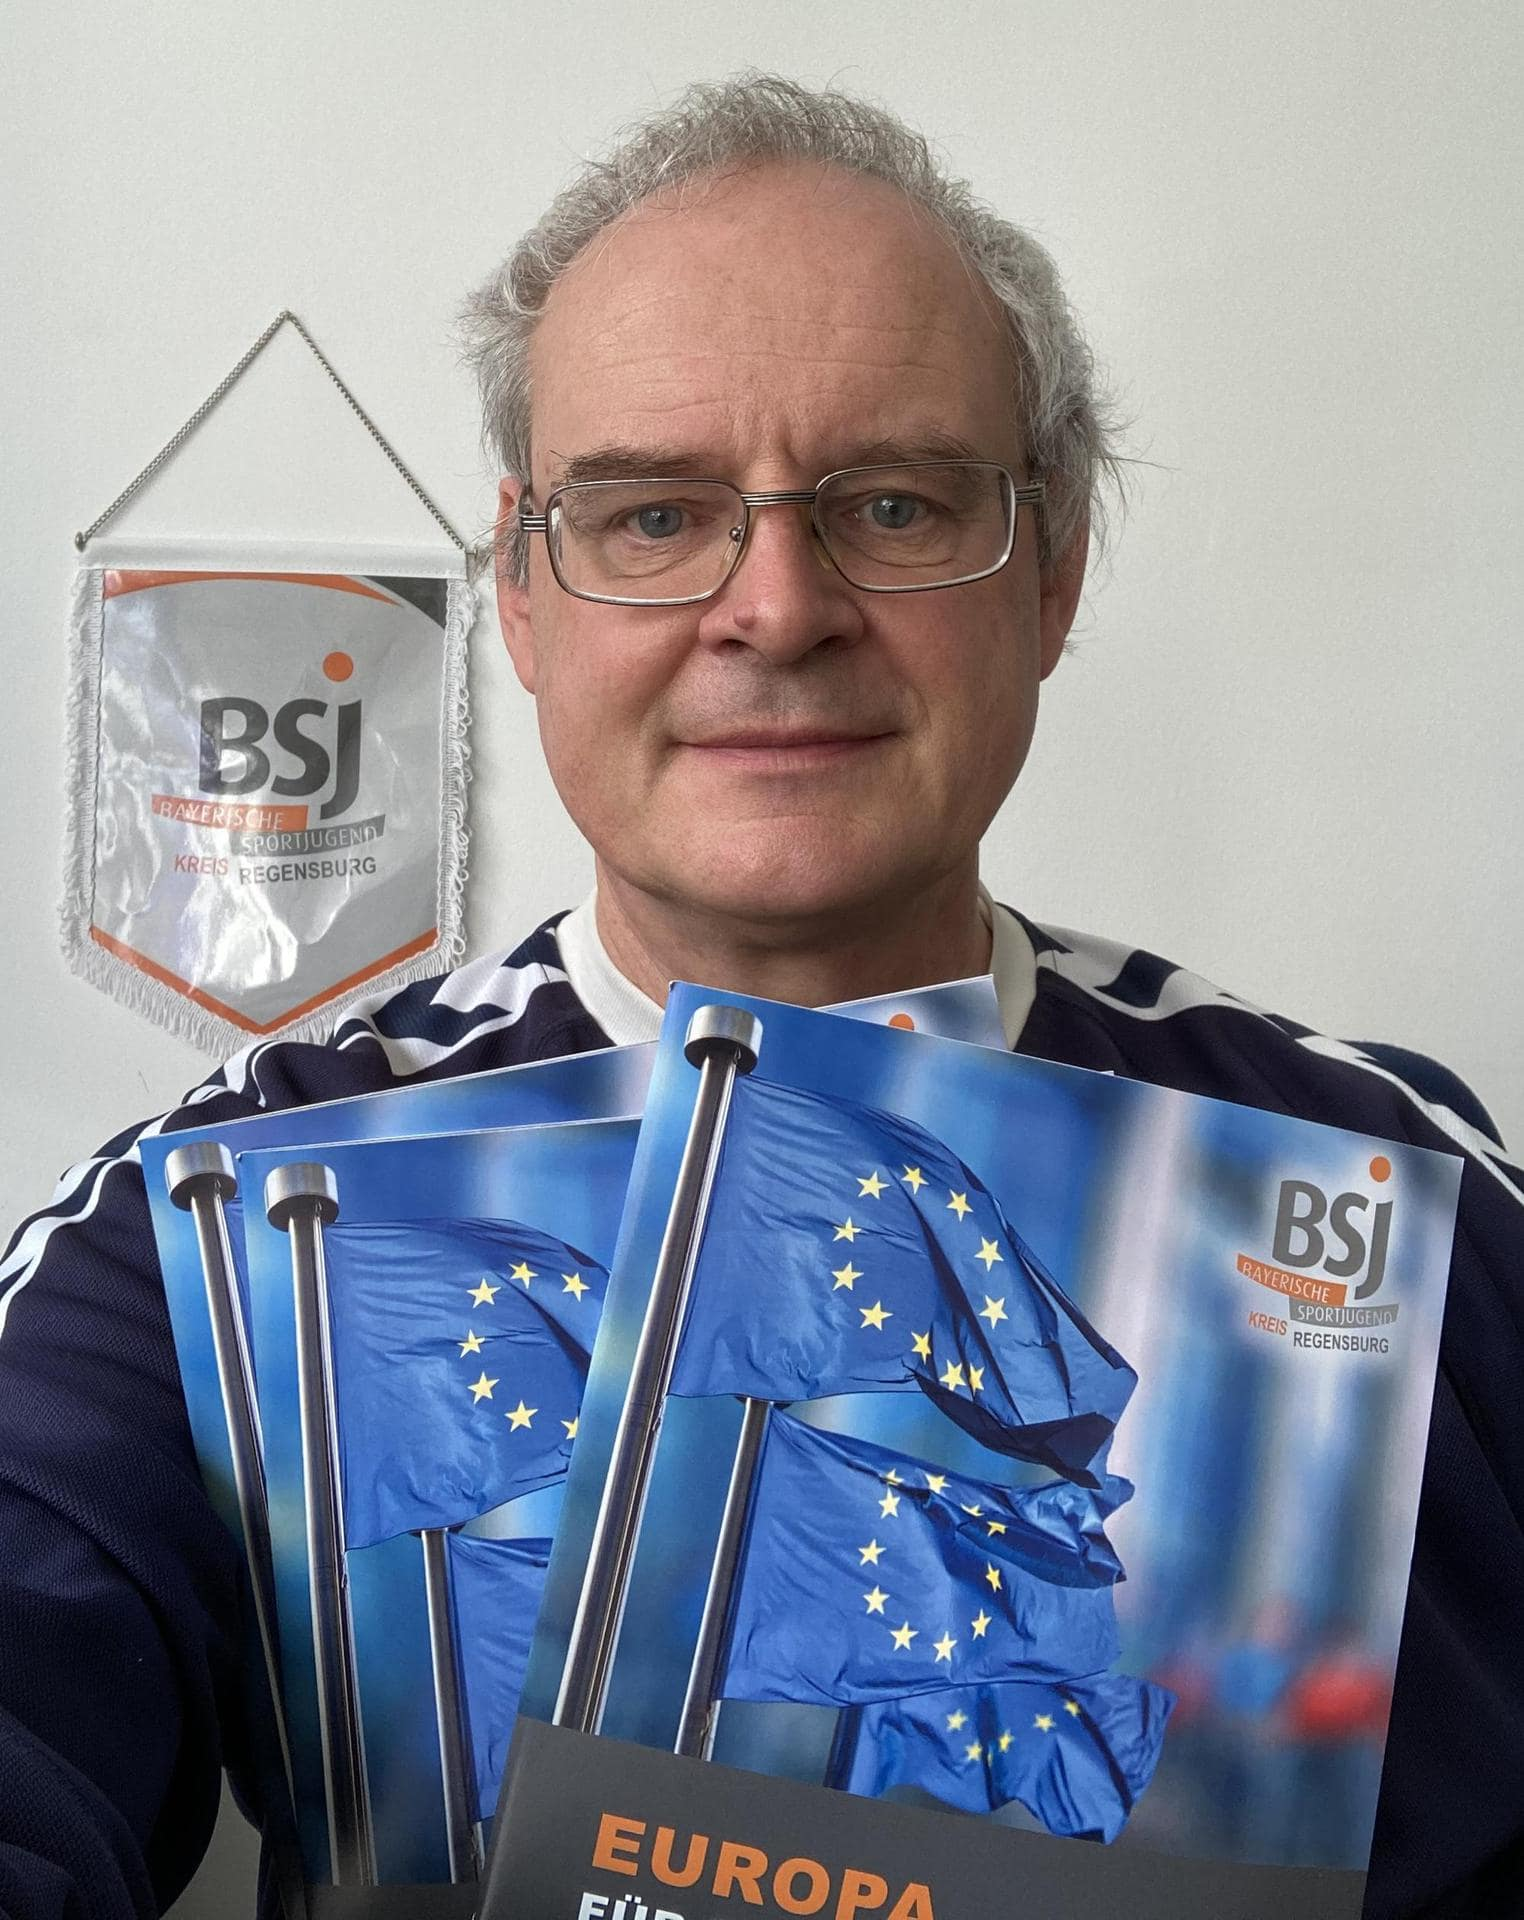 Sportjugend startet neues Europaprojekt Friedensprojekt Europa